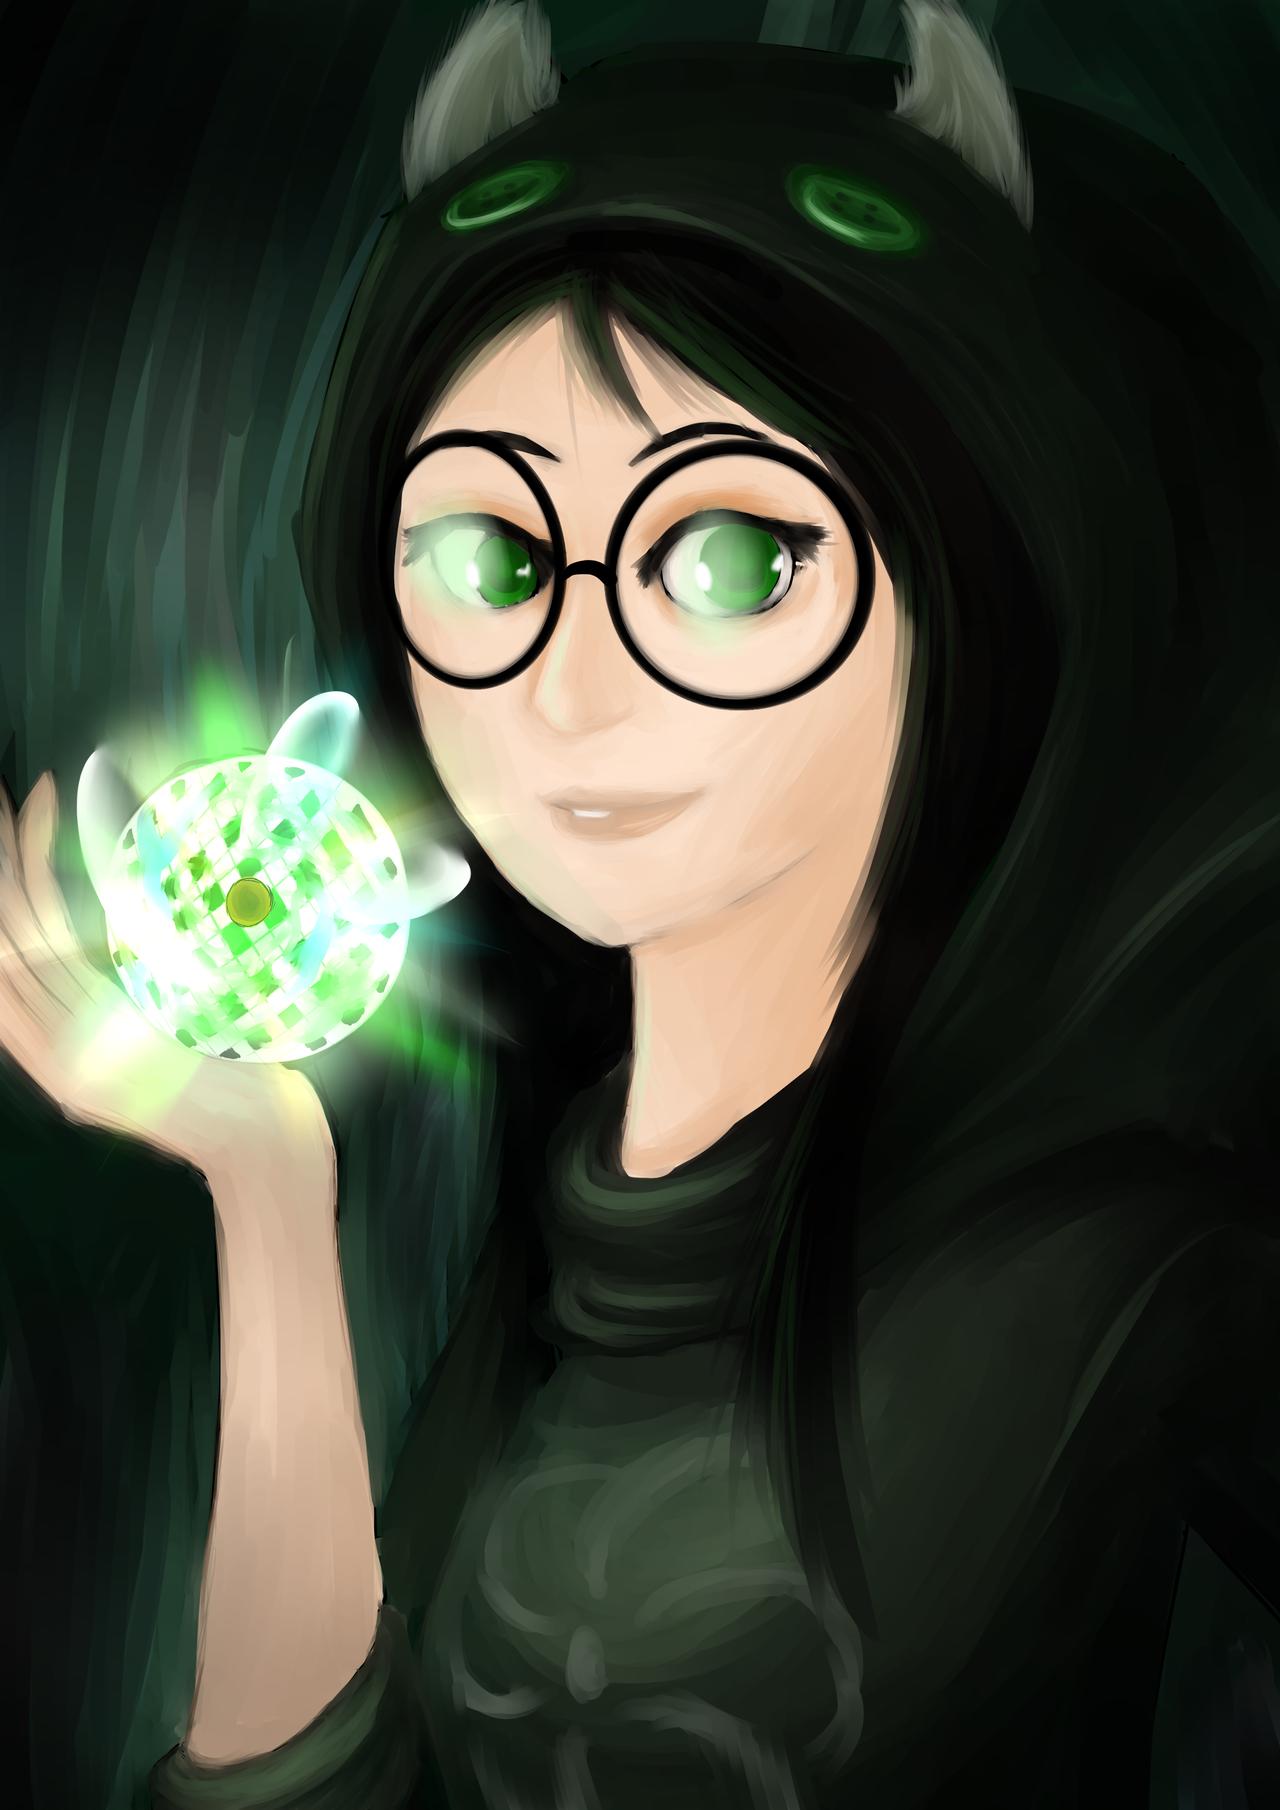 Jade Harley by ThePhantomArts